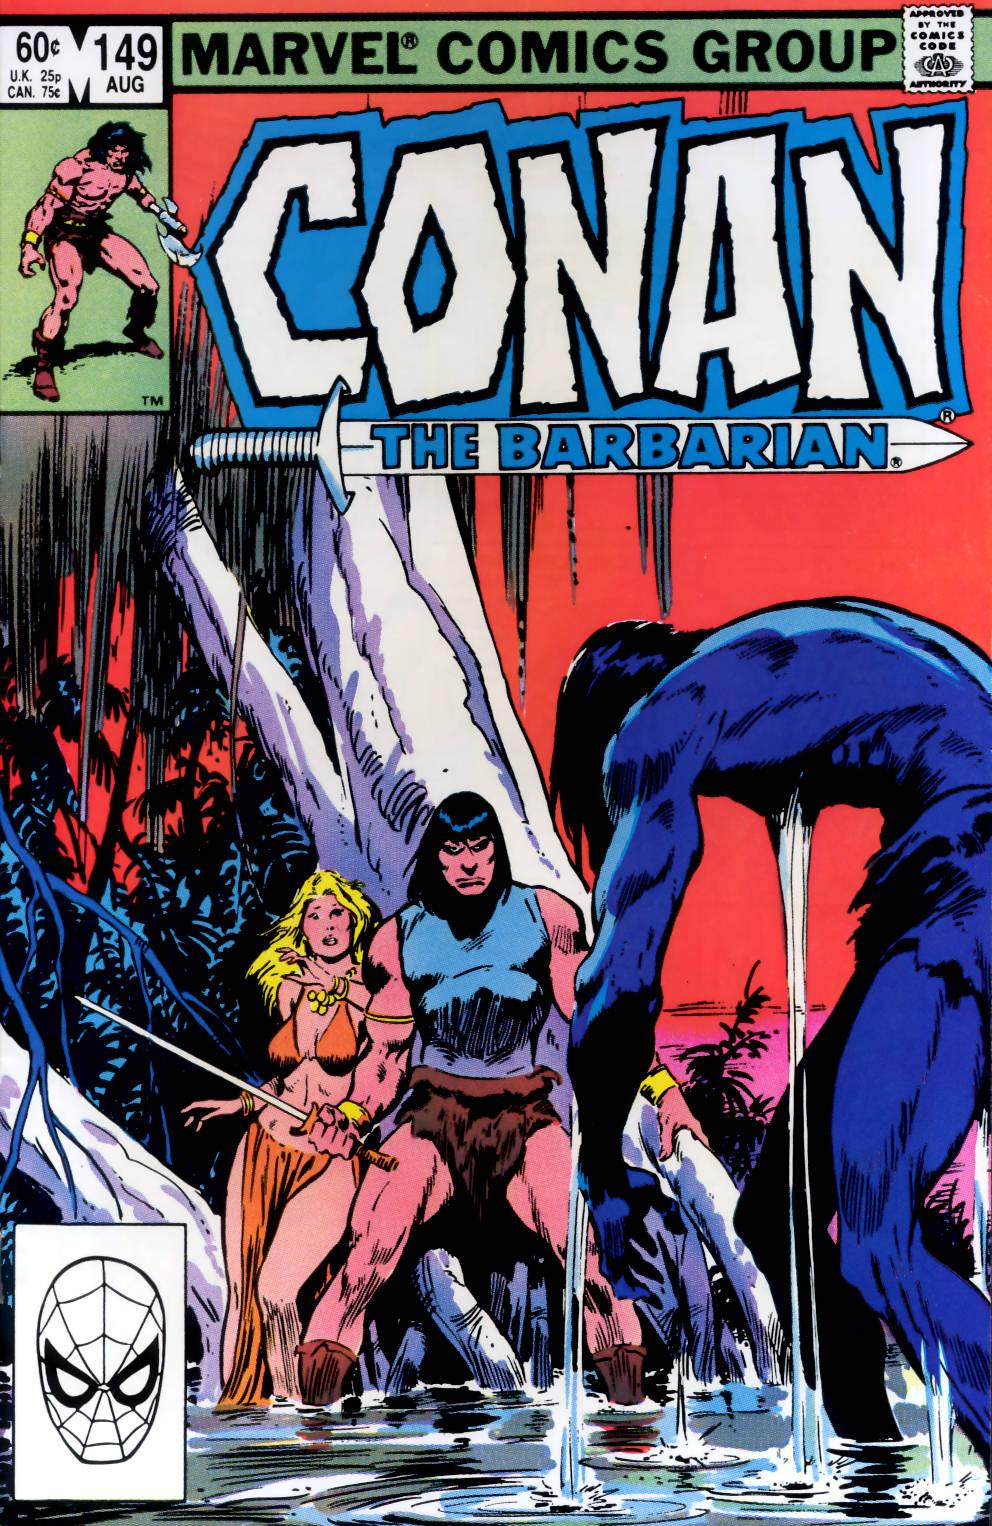 Conan the Barbarian (1970) Issue #149 #161 - English 1